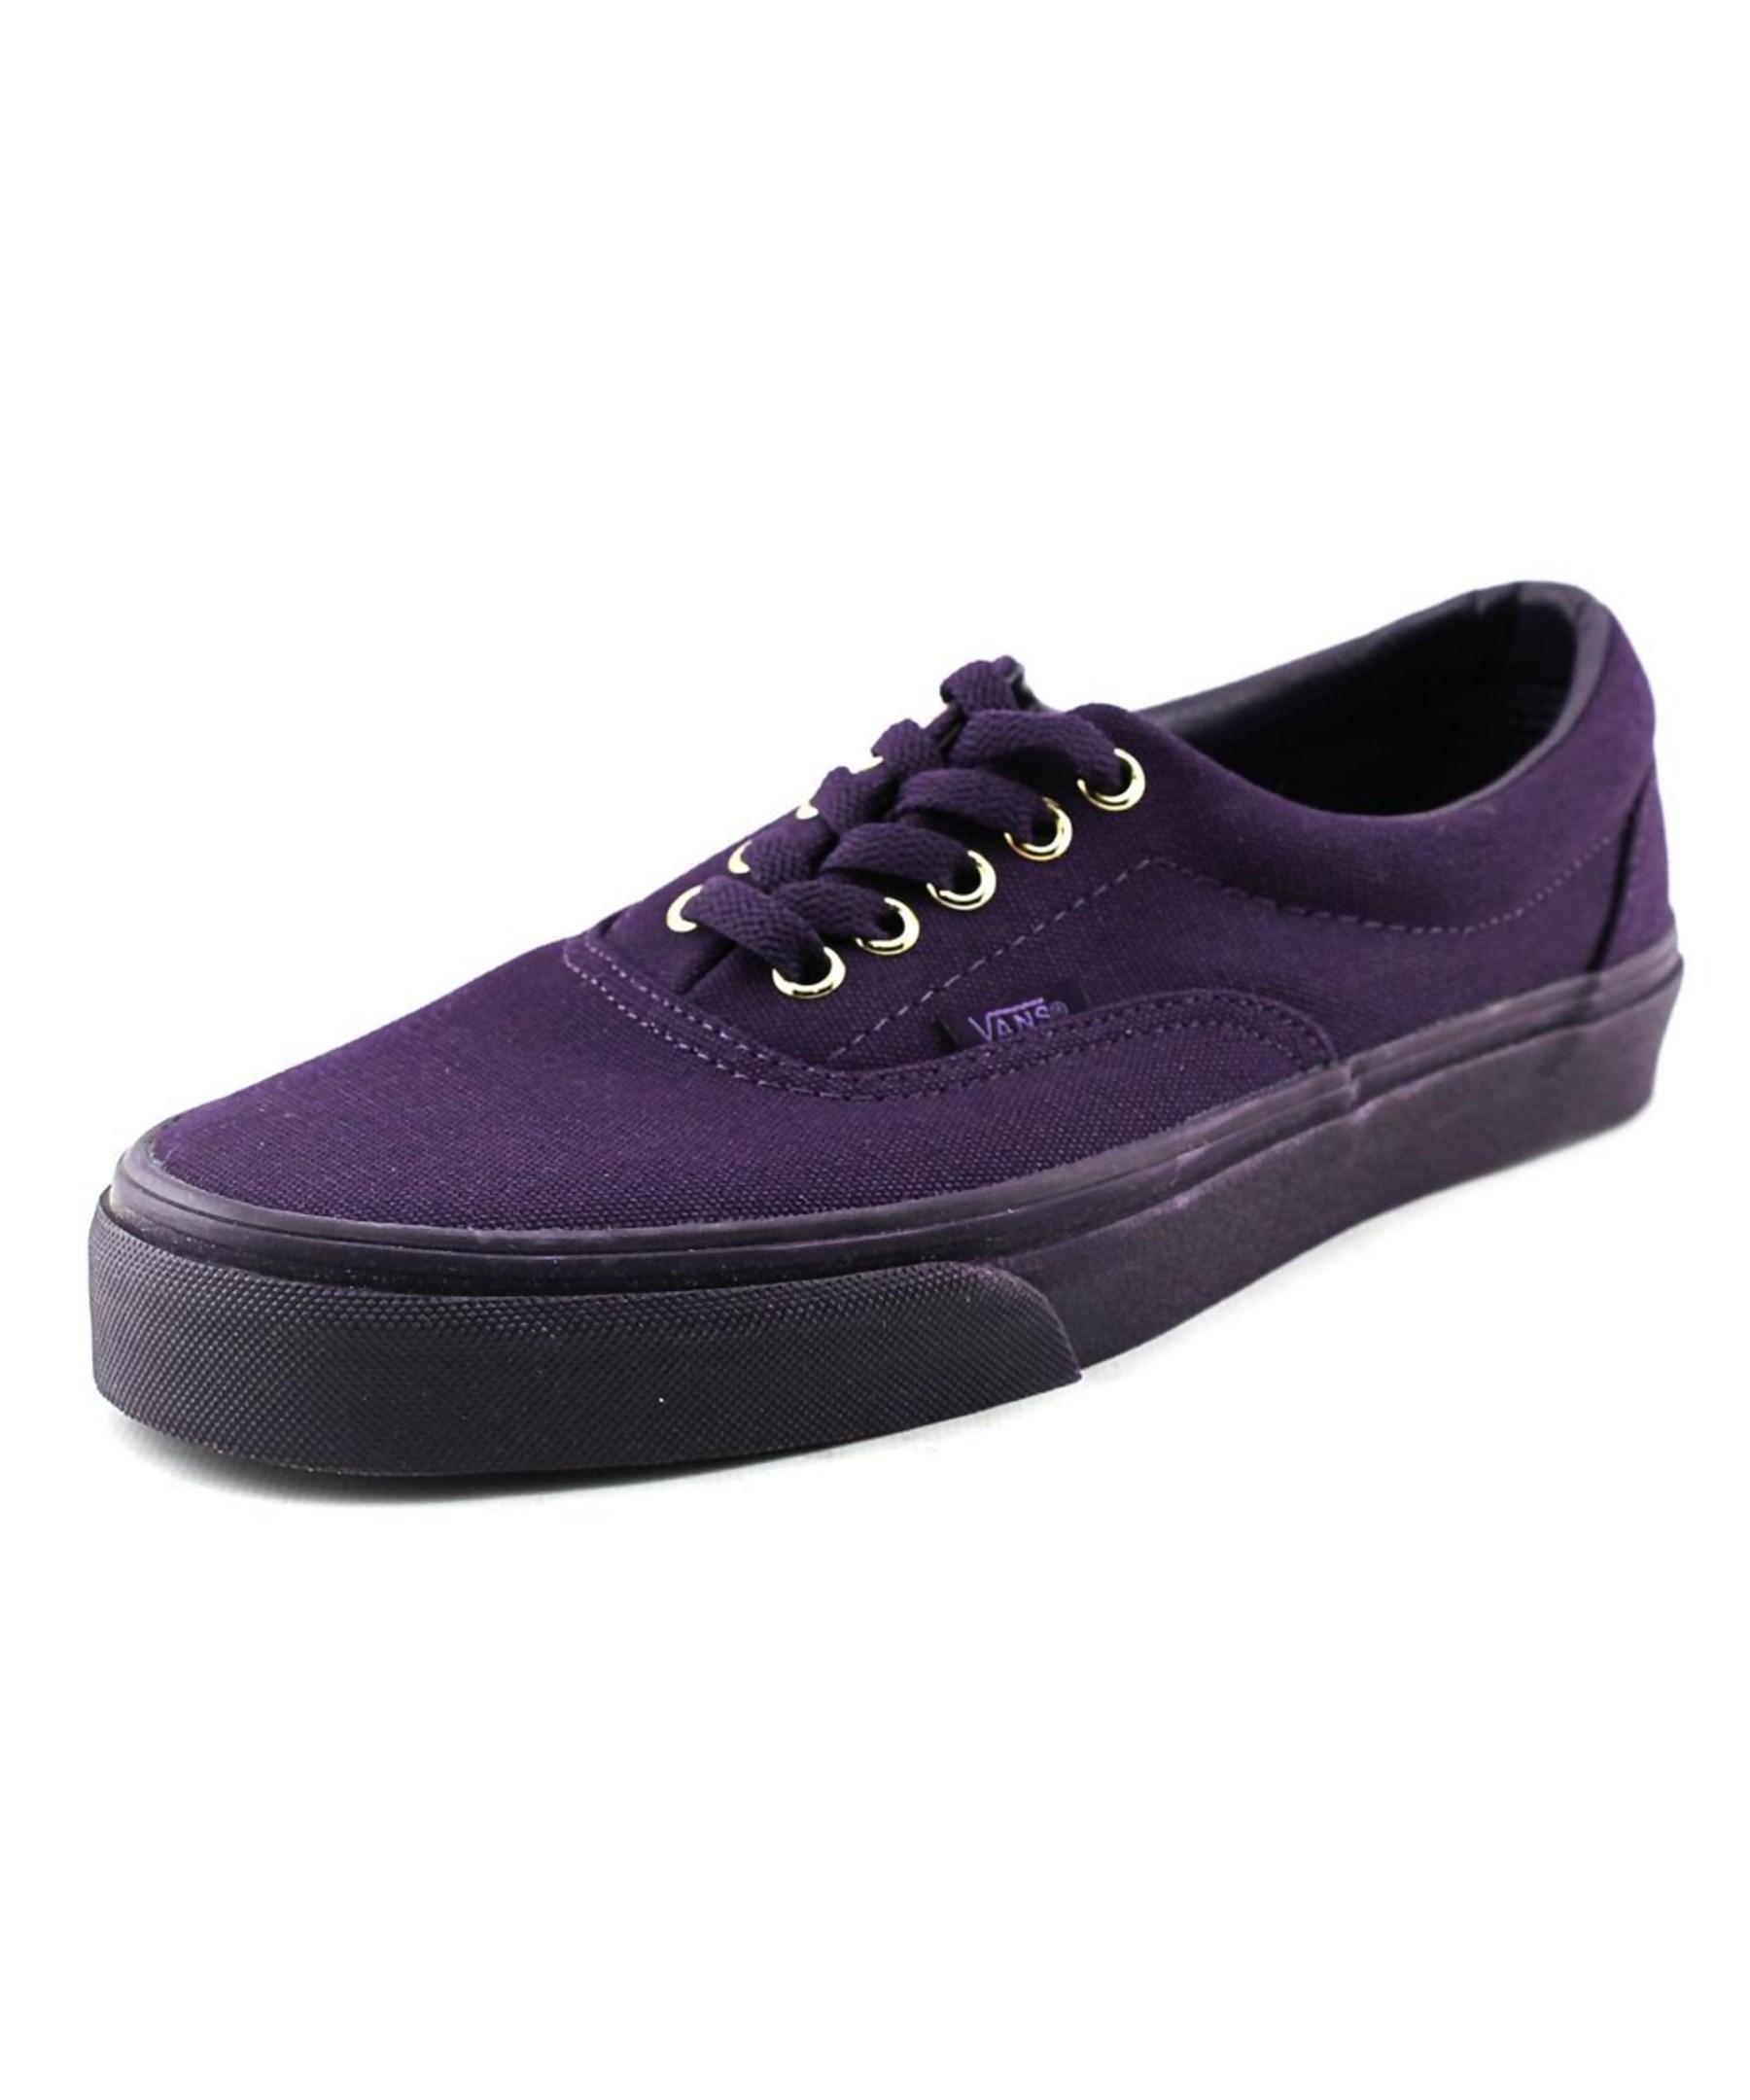 vans era toe canvas sneakers in purple for lyst